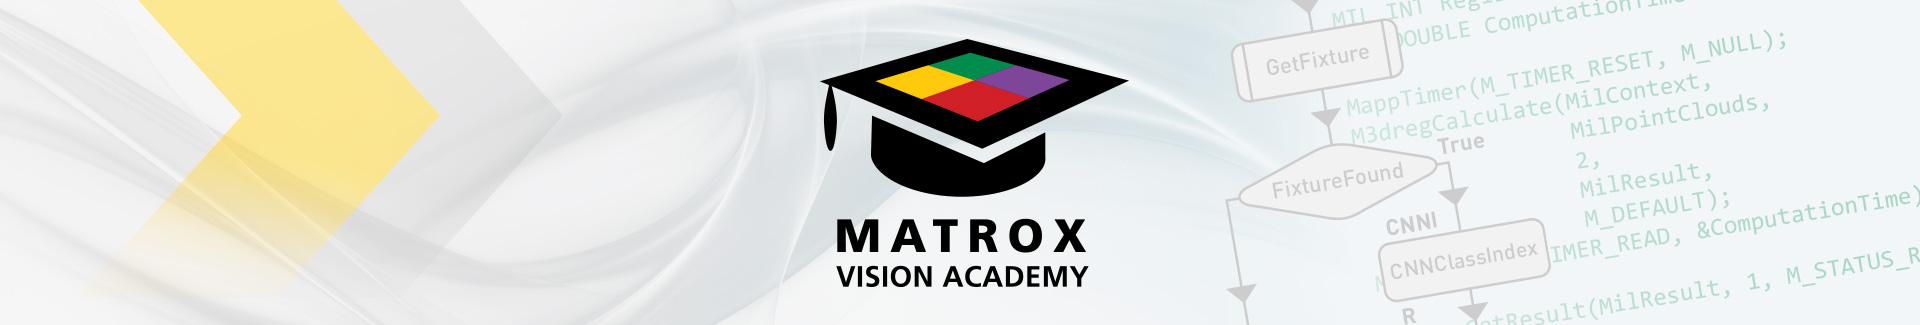 vision_academy_header_1920x325